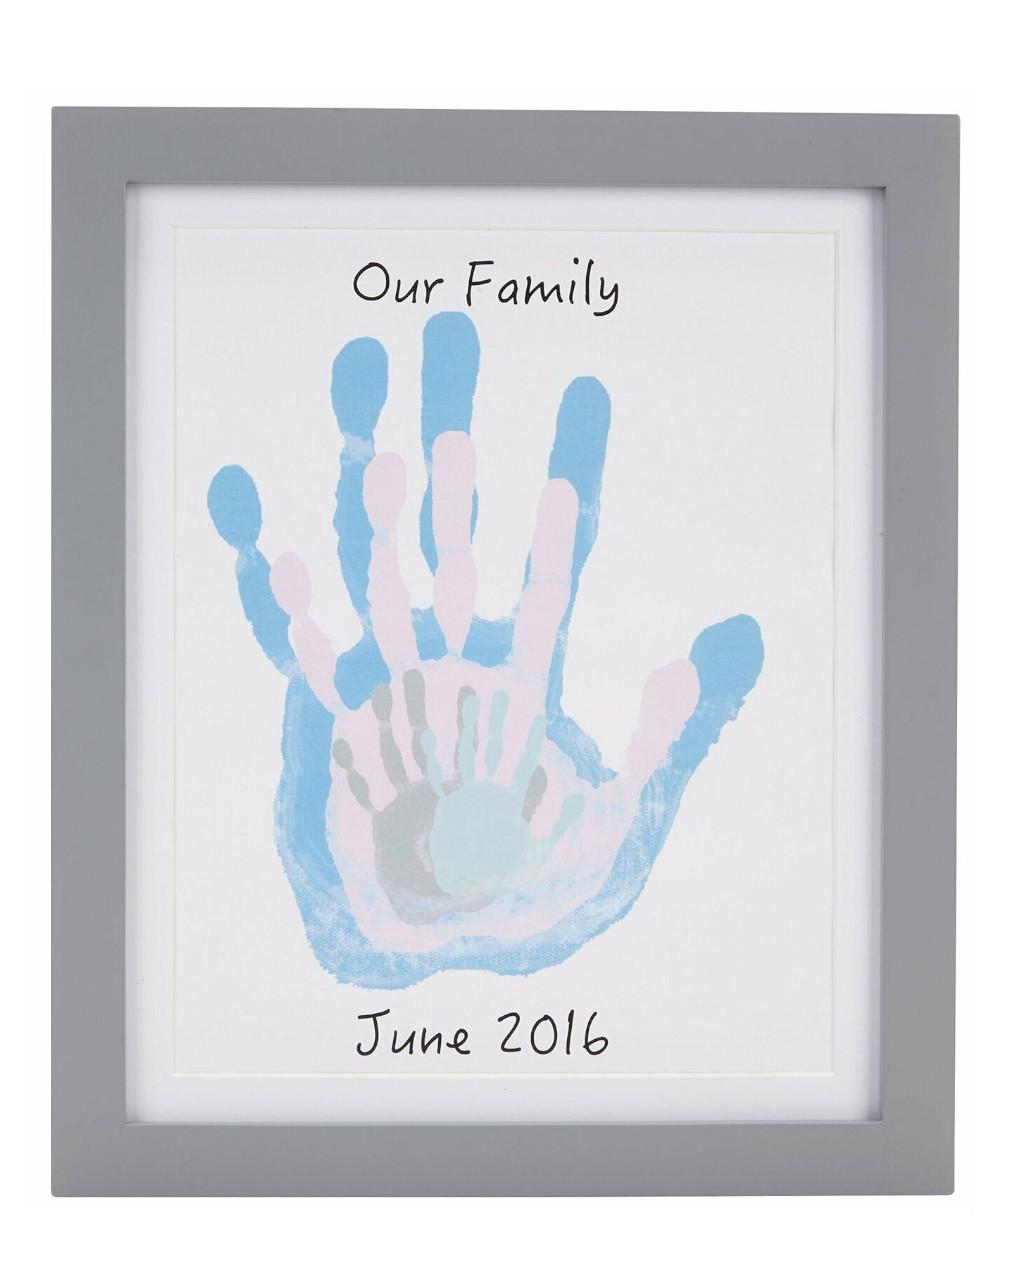 Family handprint frame - Pearhead